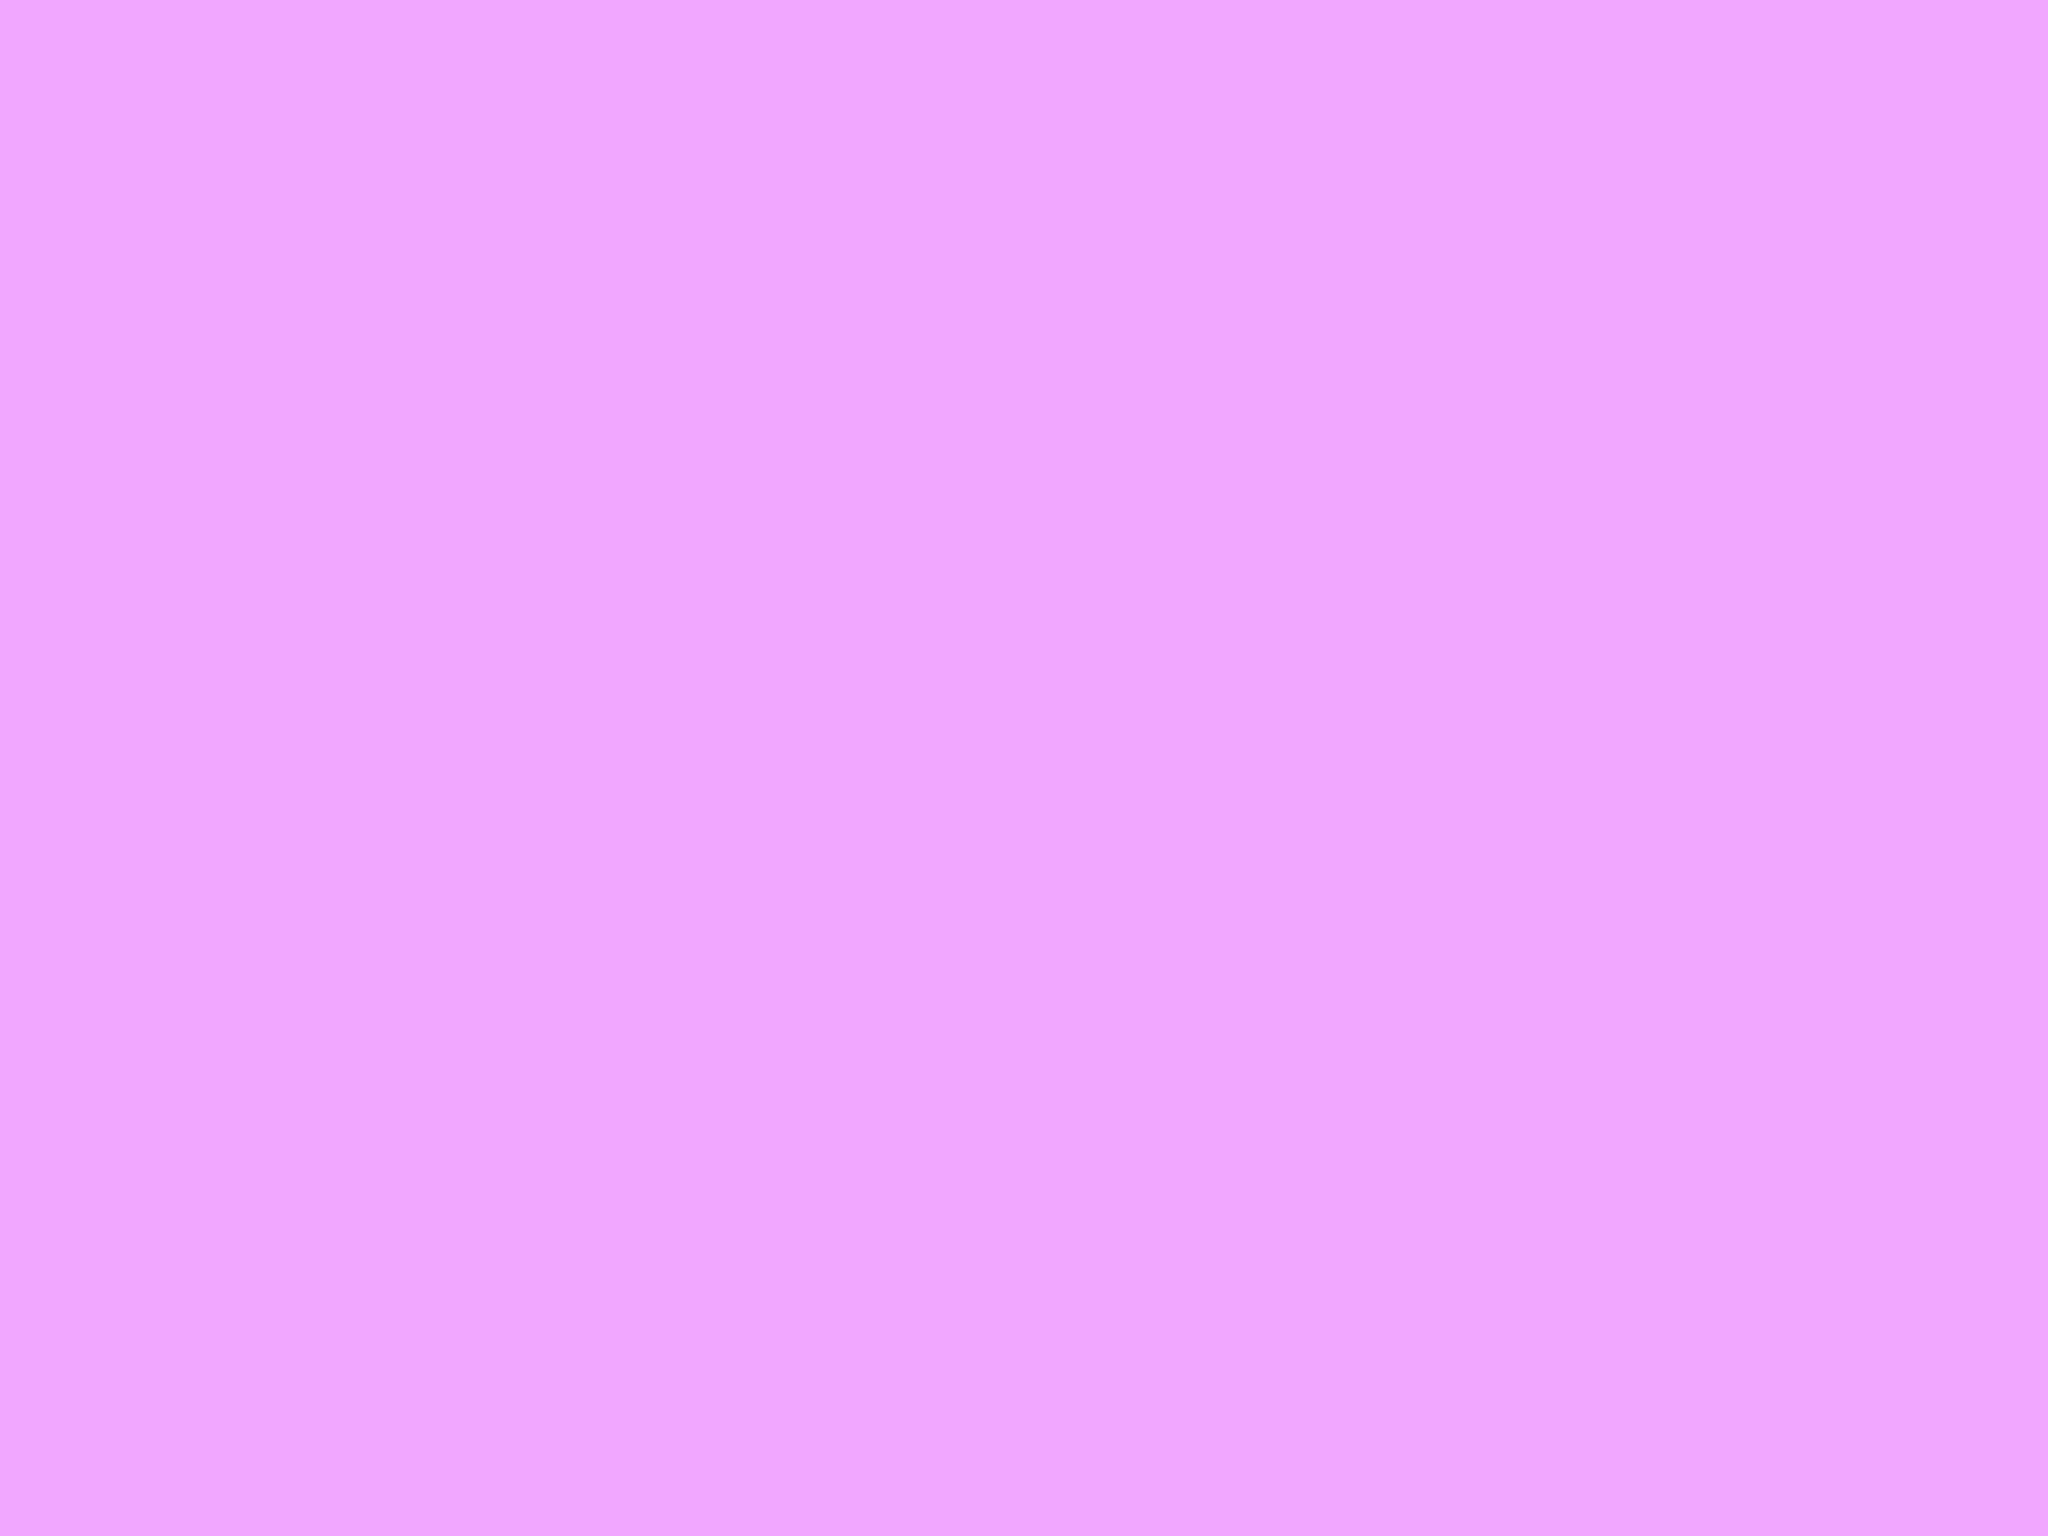 2048x1536 Rich Brilliant Lavender Solid Color Background